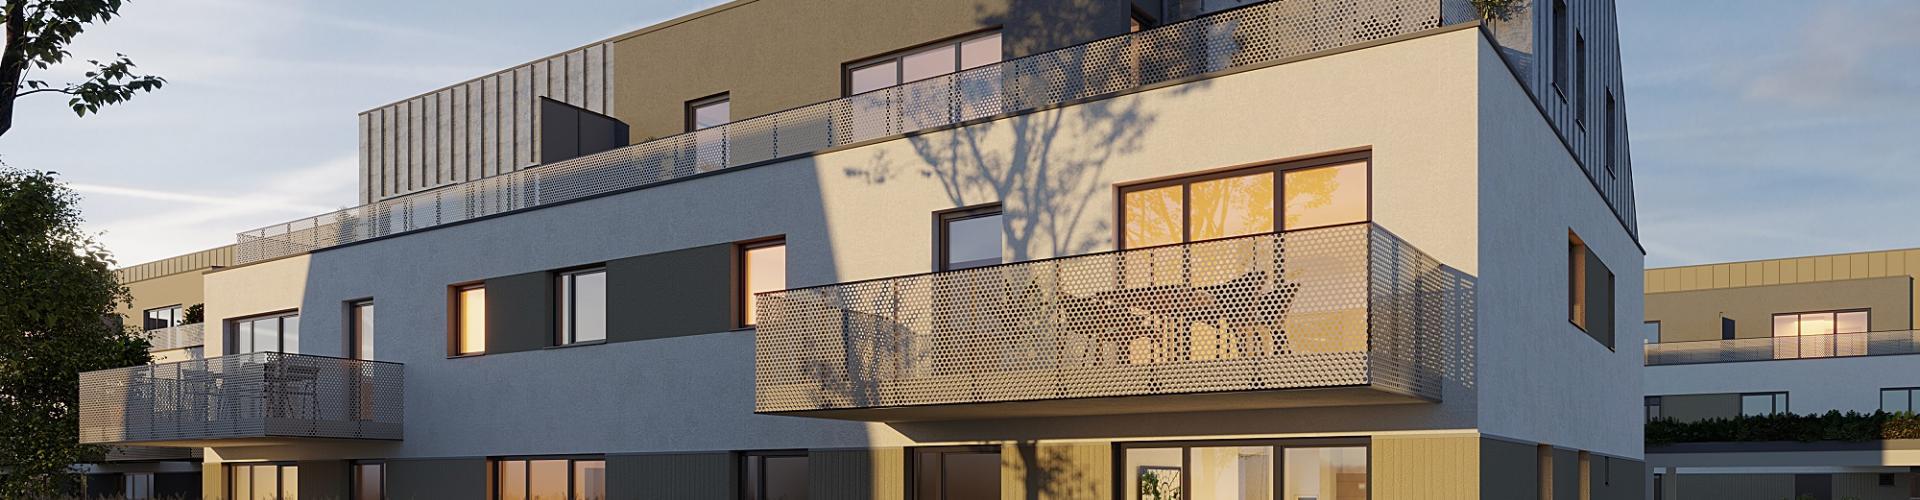 Programme immobilier neuf Ingersheim-Cyllene